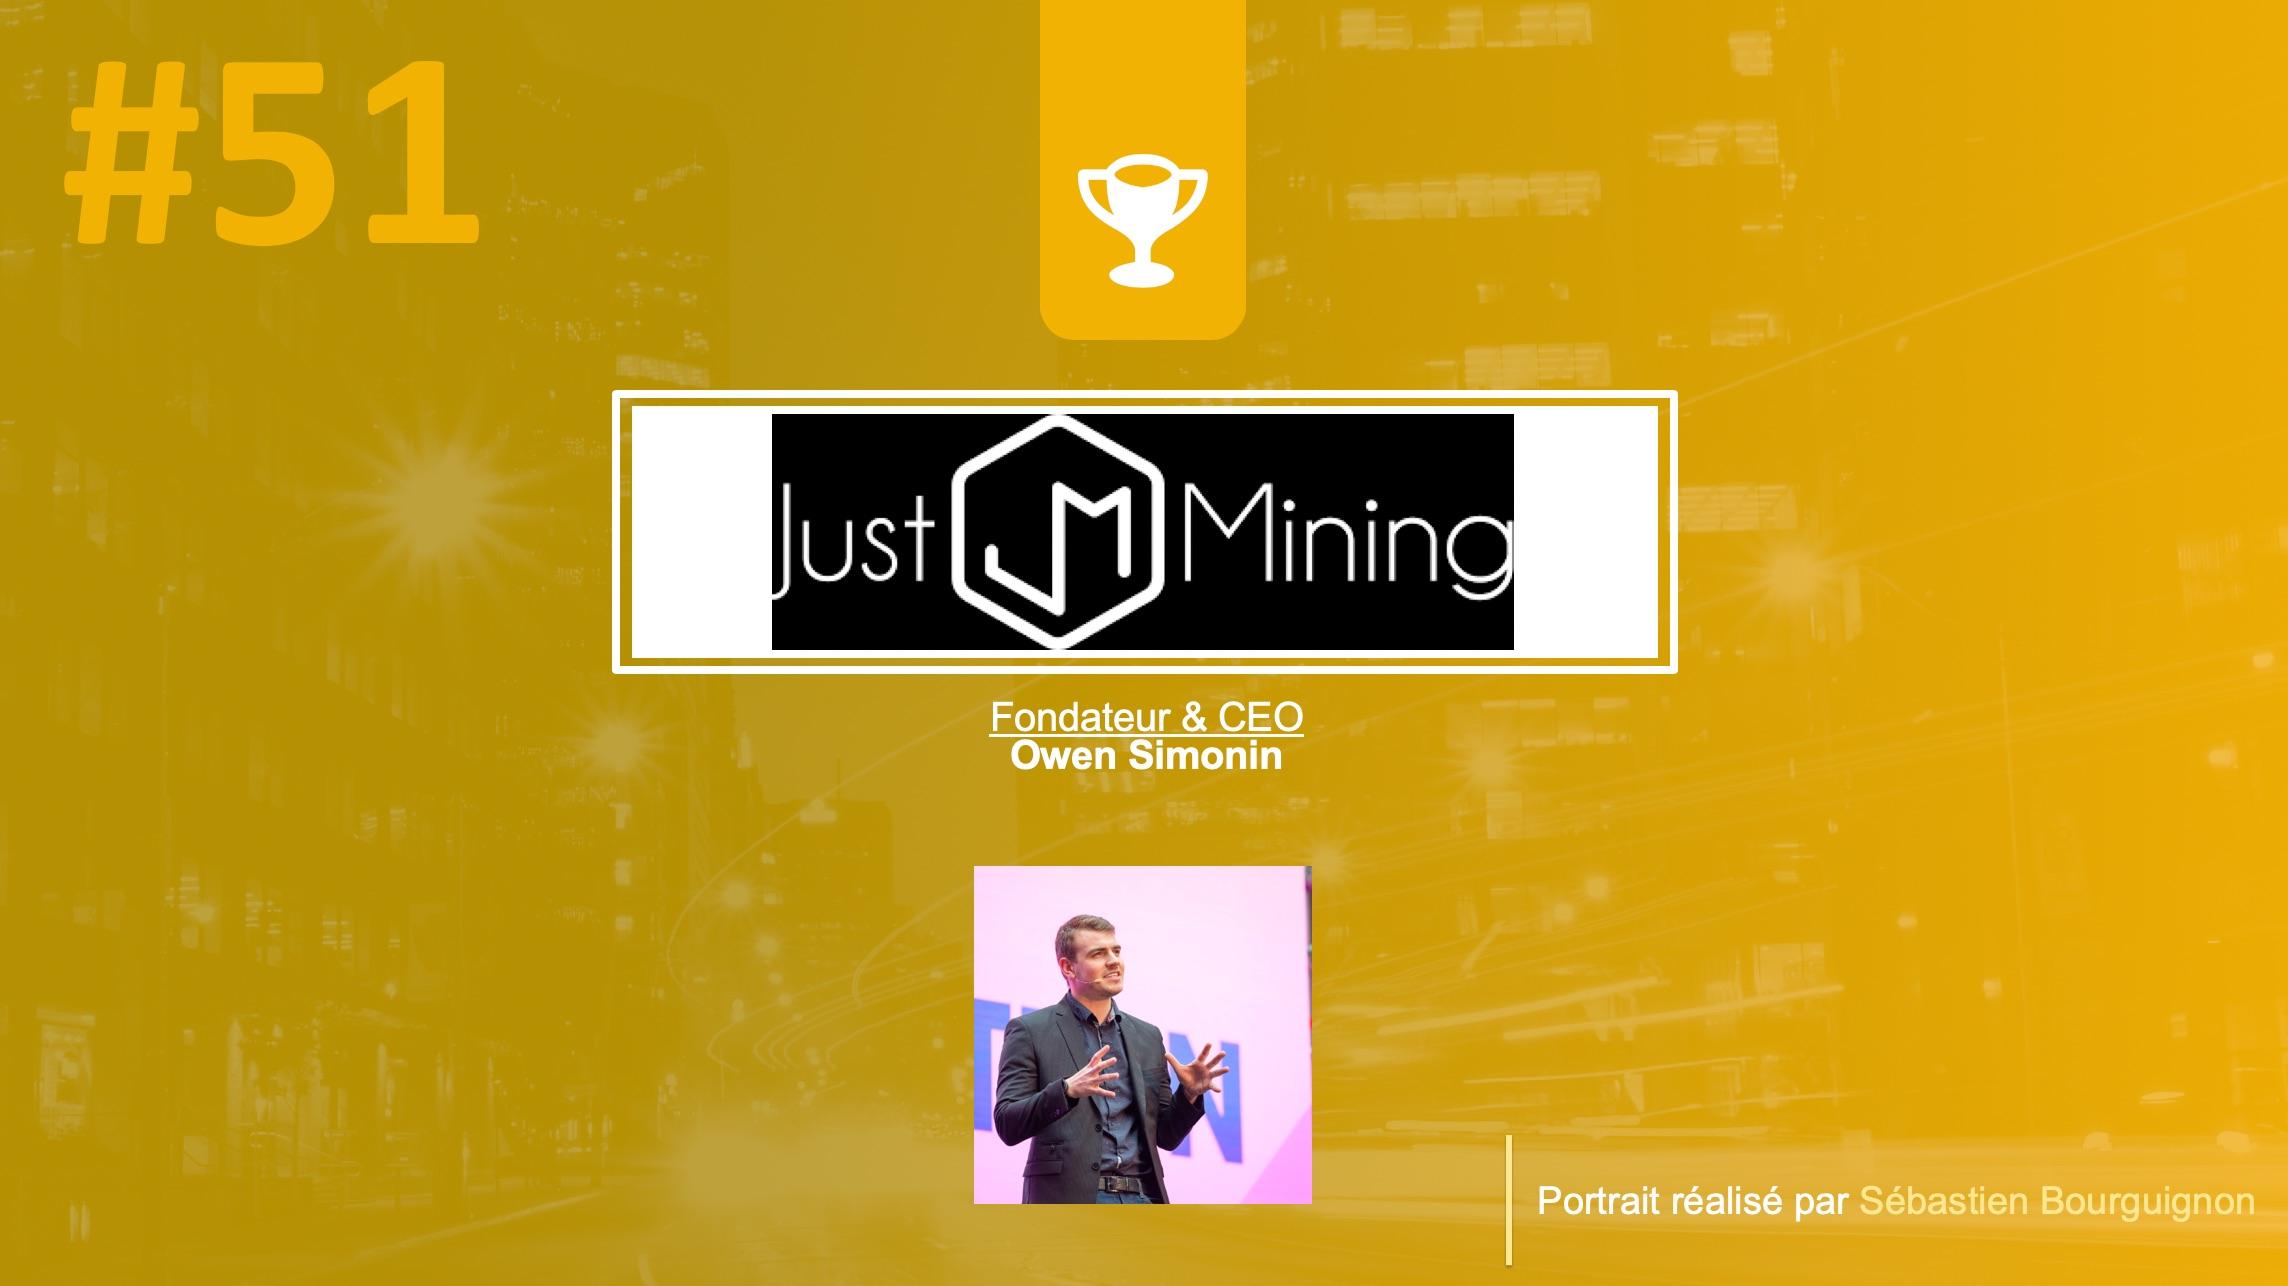 just mining